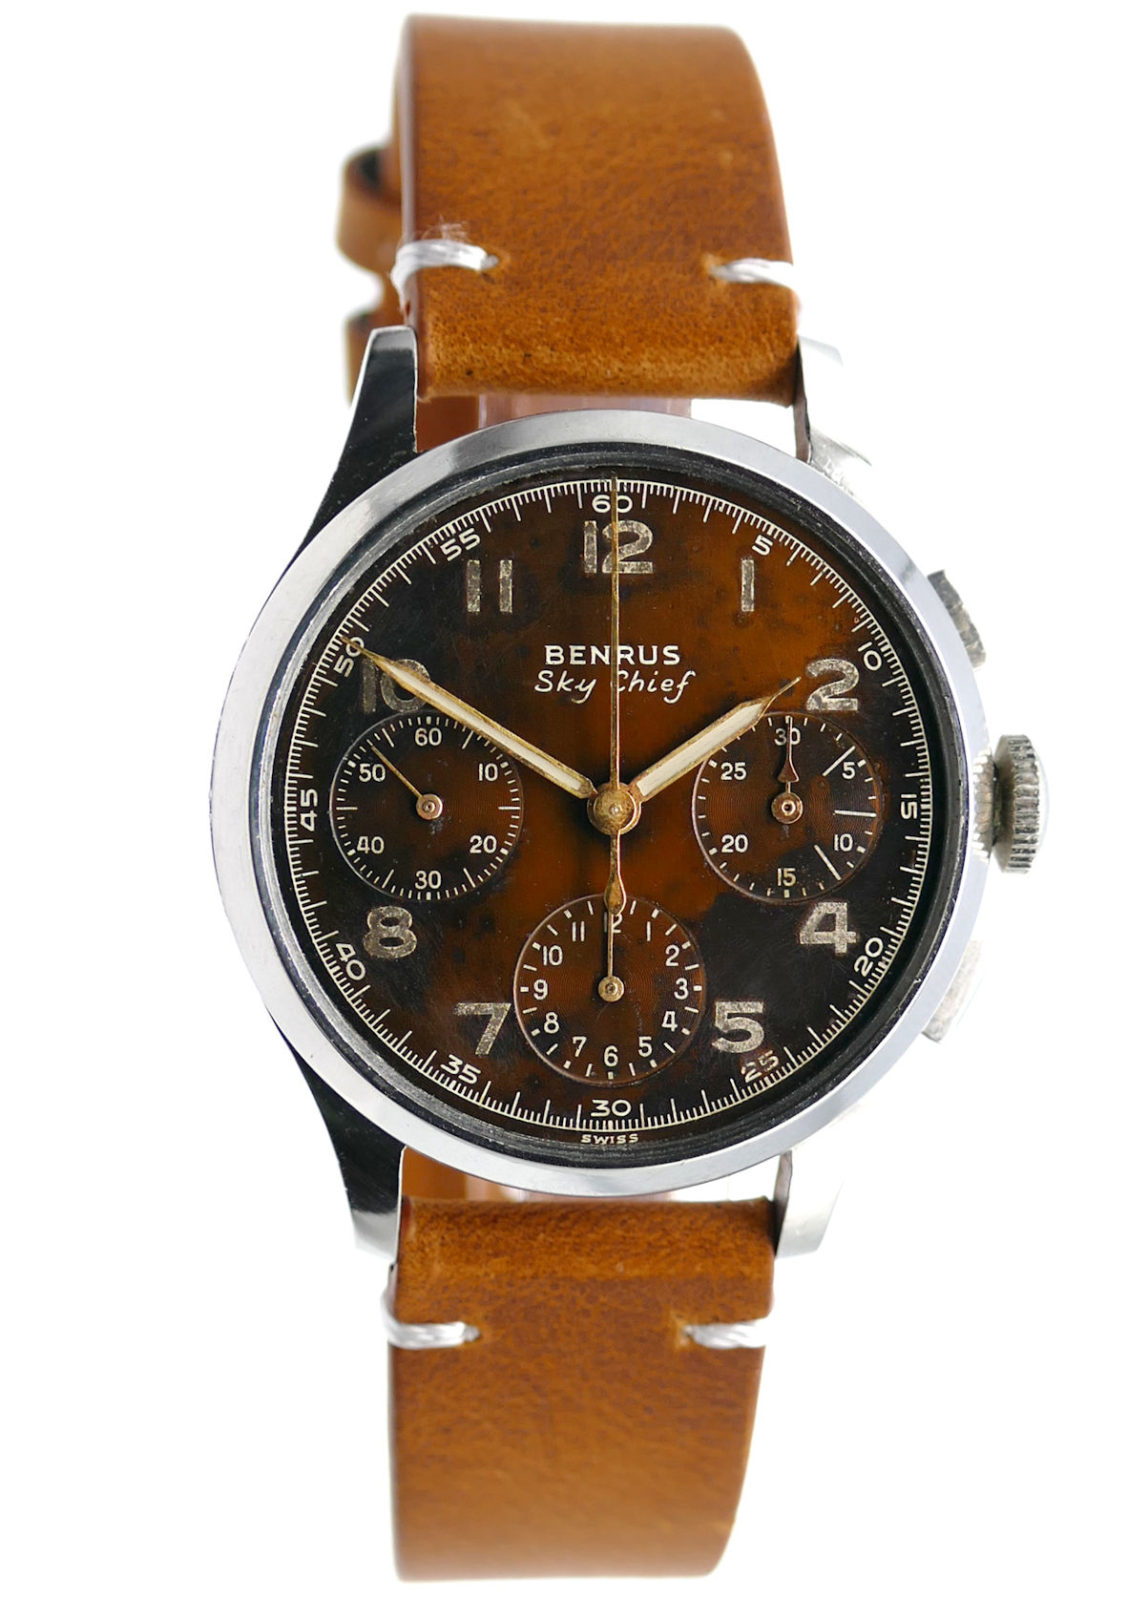 Benrus Sky Chief Tropical Dial Vintage Chronograph